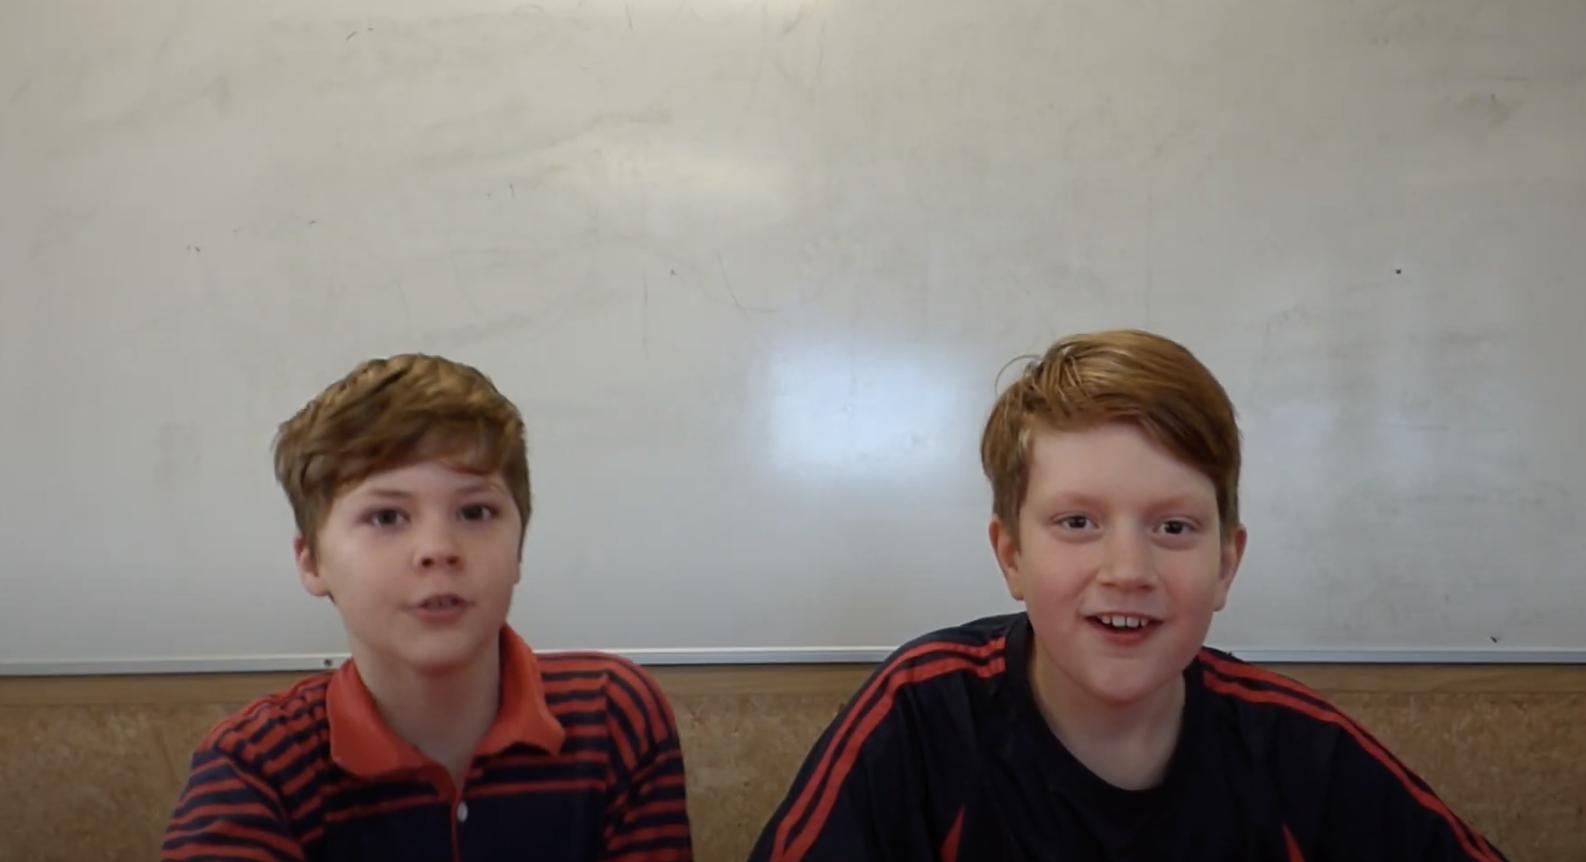 Somerfield Te Kura Wairepo school boys smiling